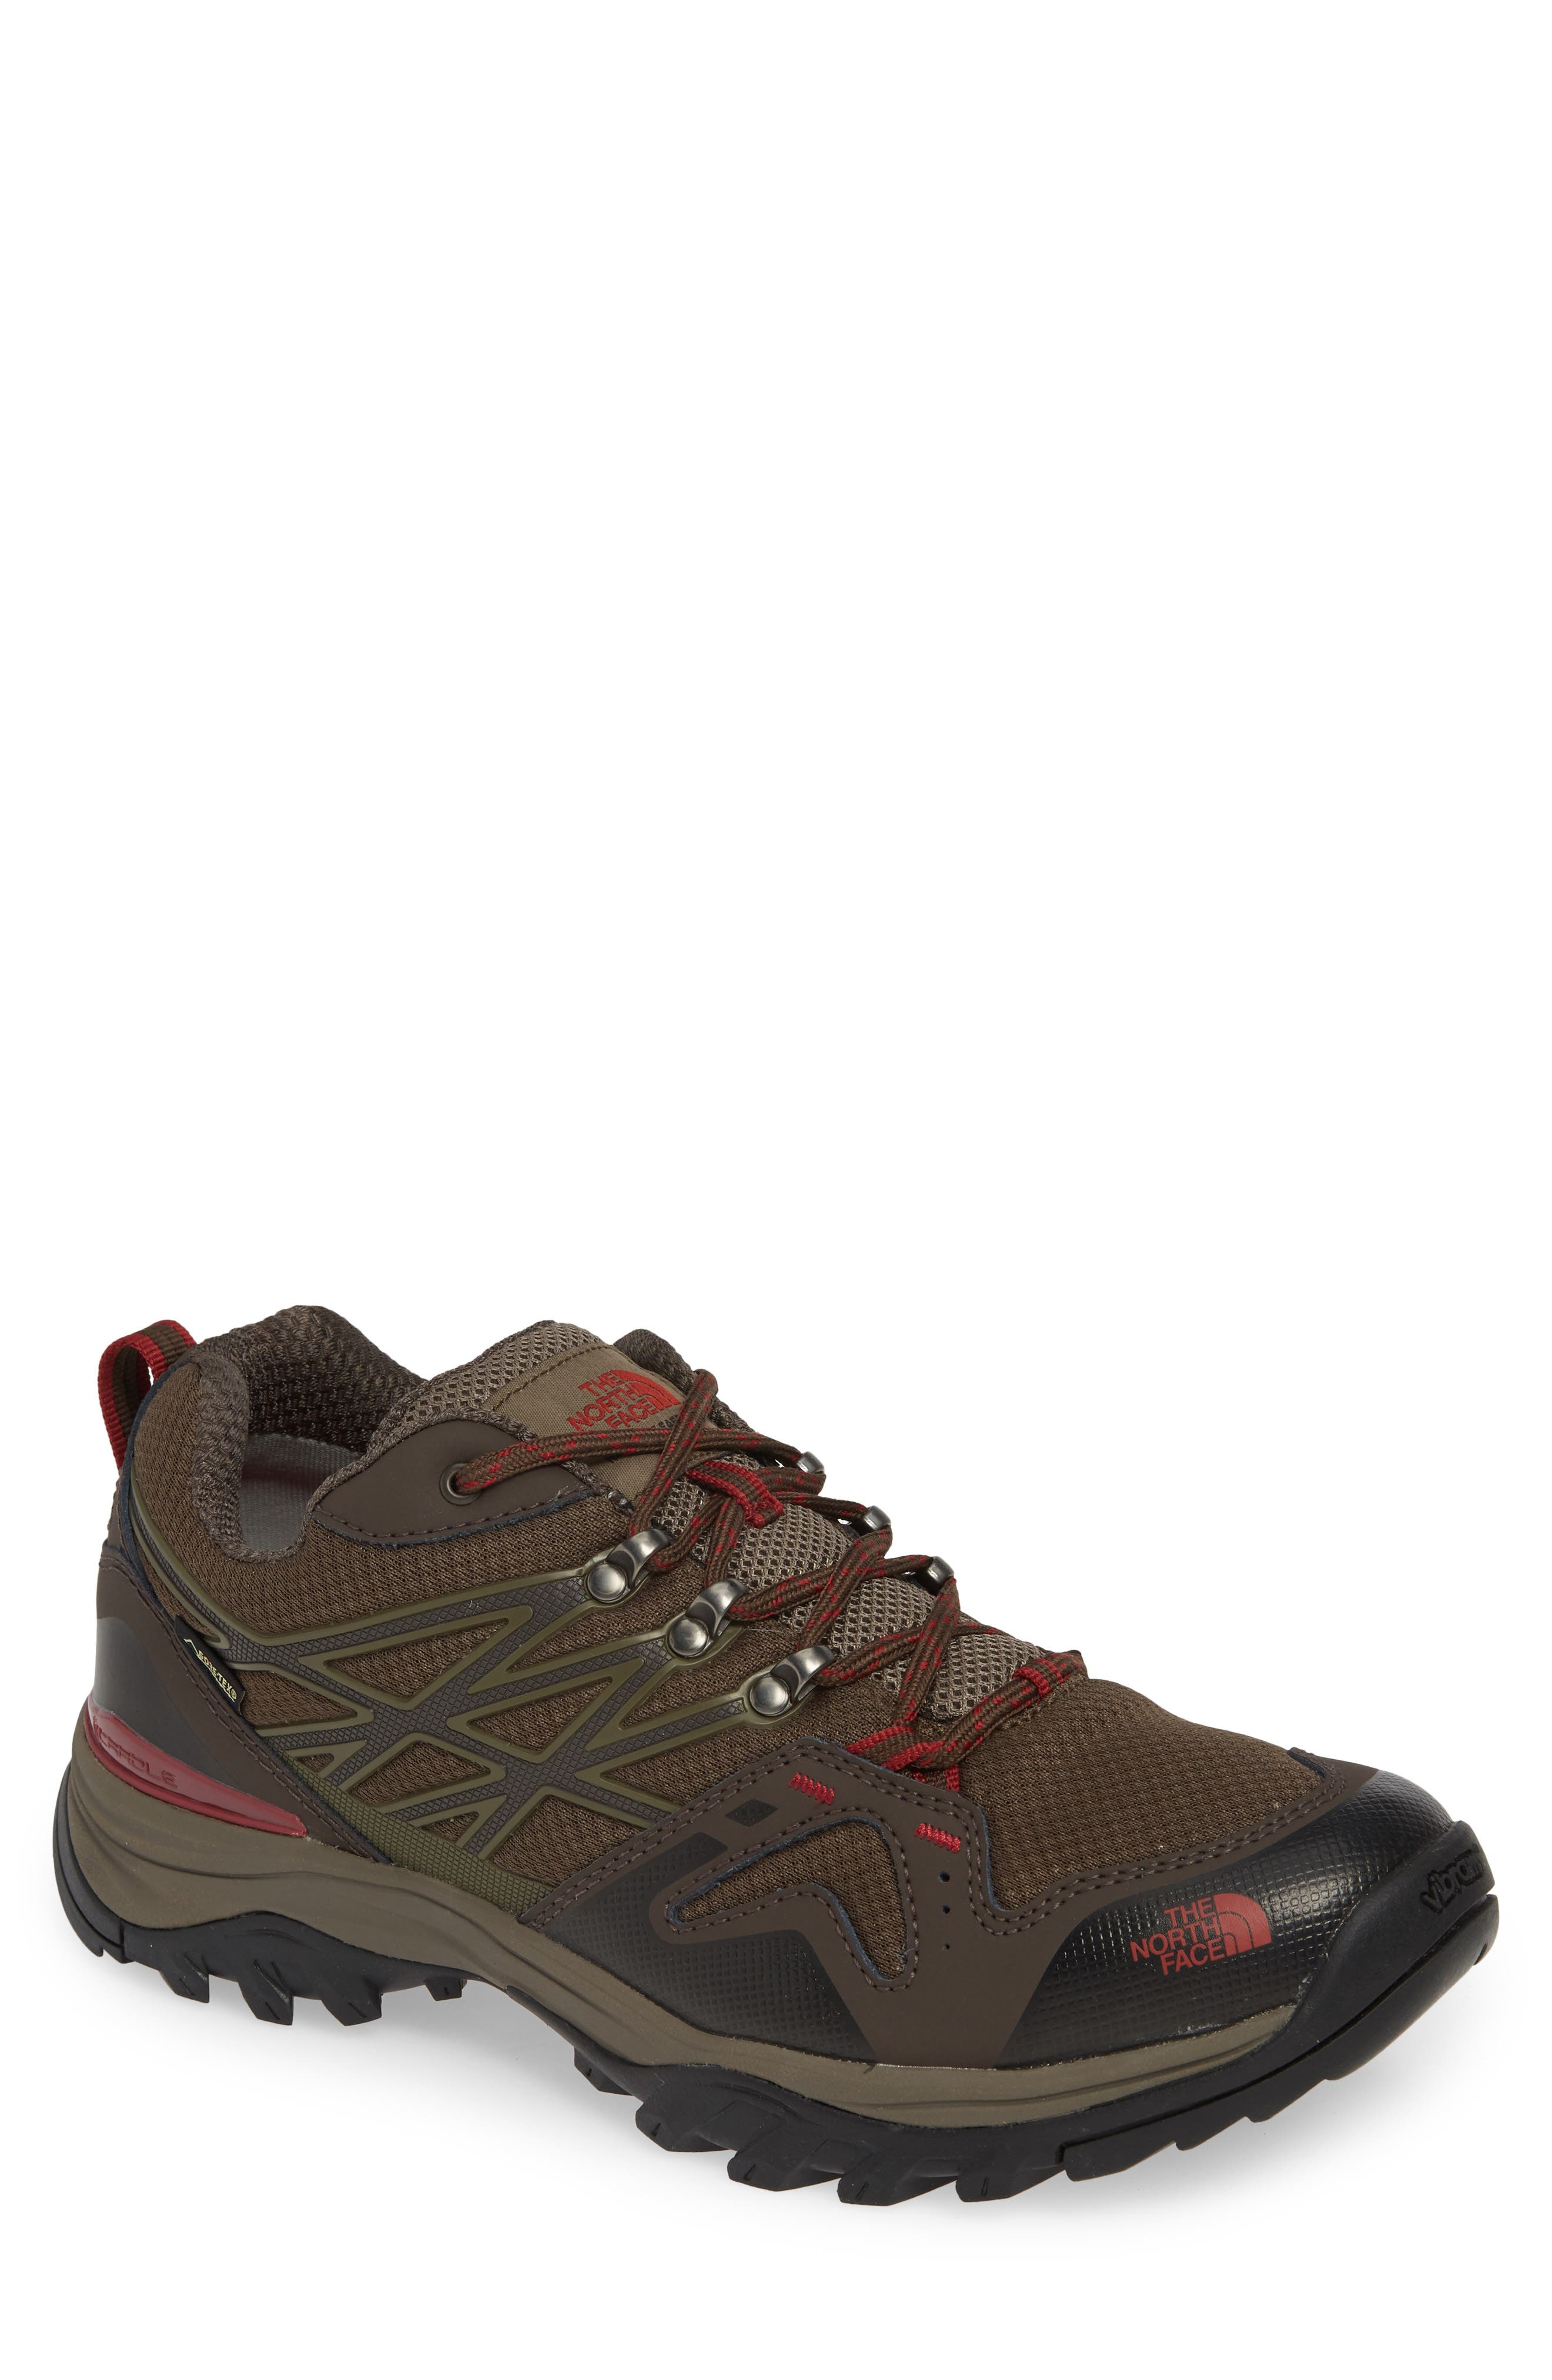 6930bb8d1deb The North Face  Hedgehog Fastpack  Gore-Tex Waterproof Hiking Shoe W - Brown